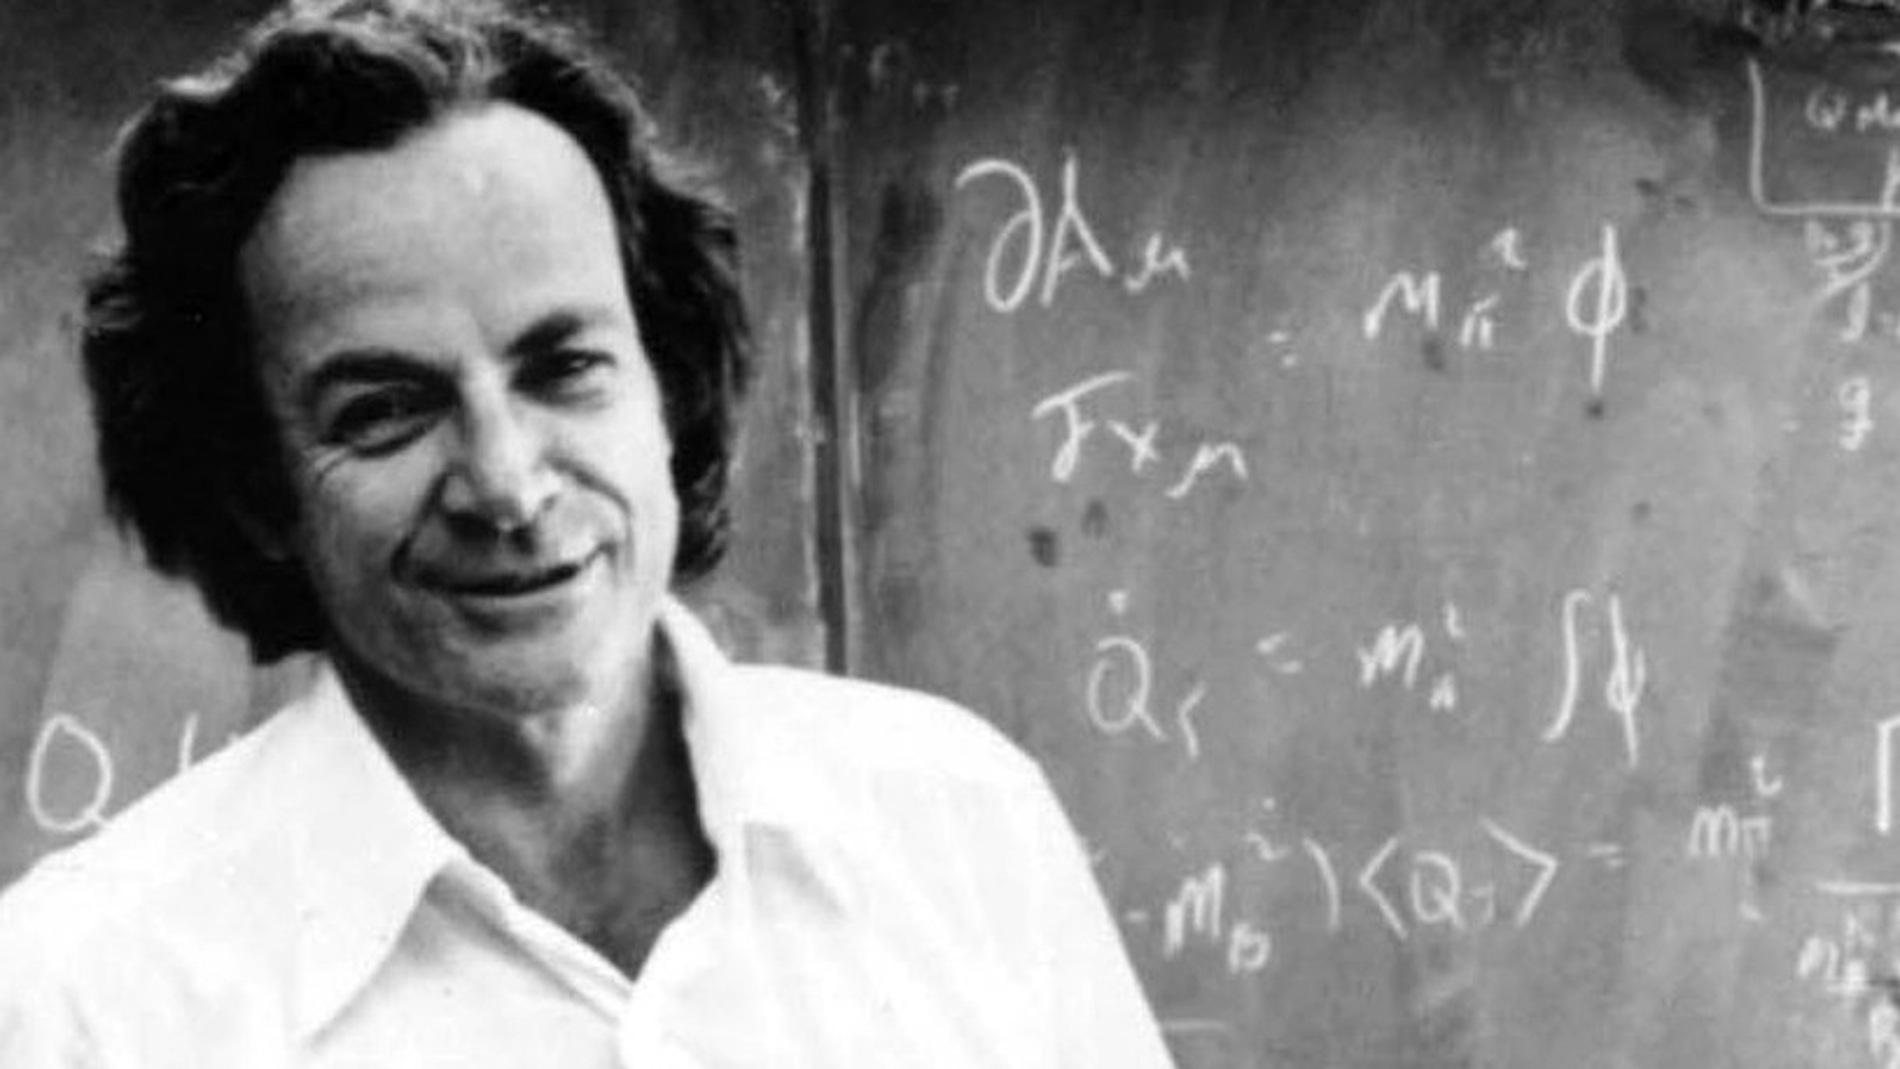 Richard Feynman, un científico 'cool'... ¿y espía soviético?